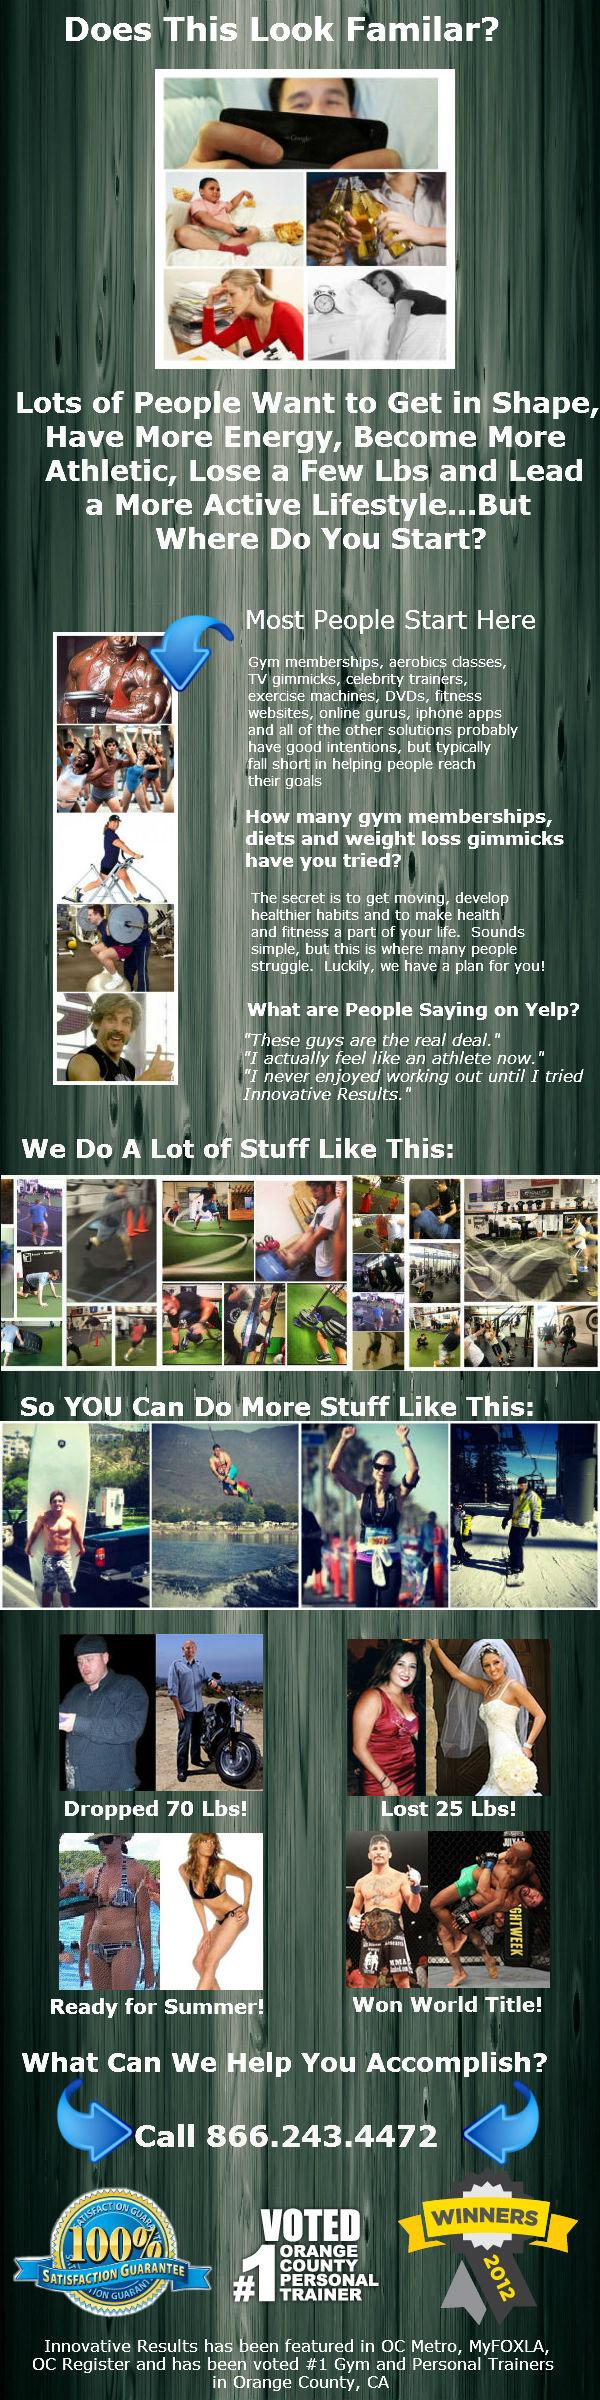 #1 fitness center in Orange County